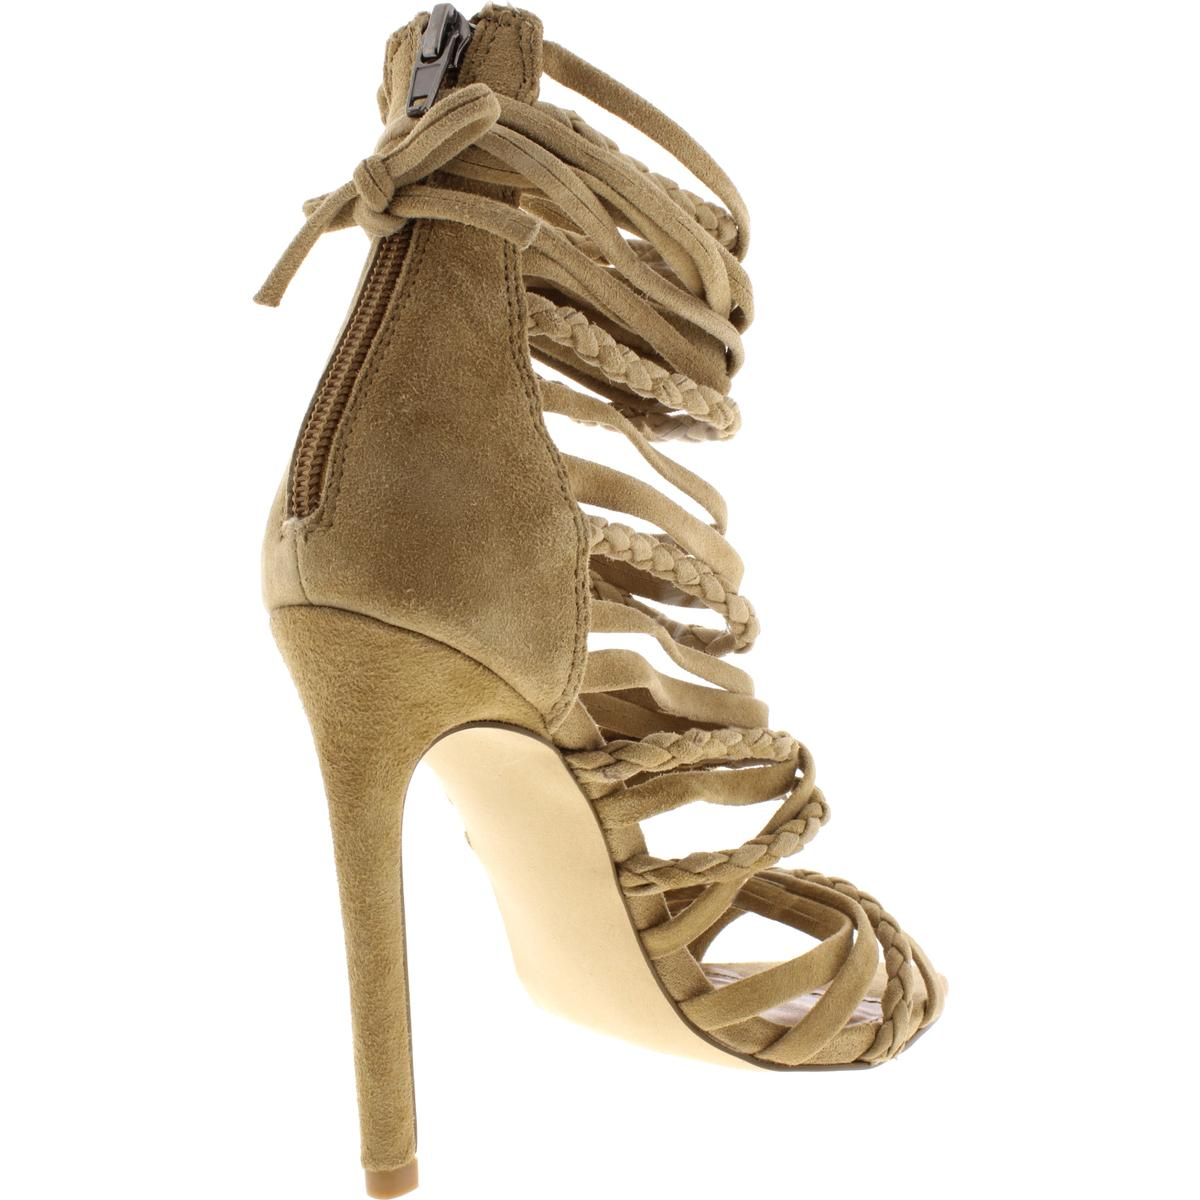 Steve Madden Womens Drexel Suede Stiletto Dress Sandals Shoes BHFO 2267